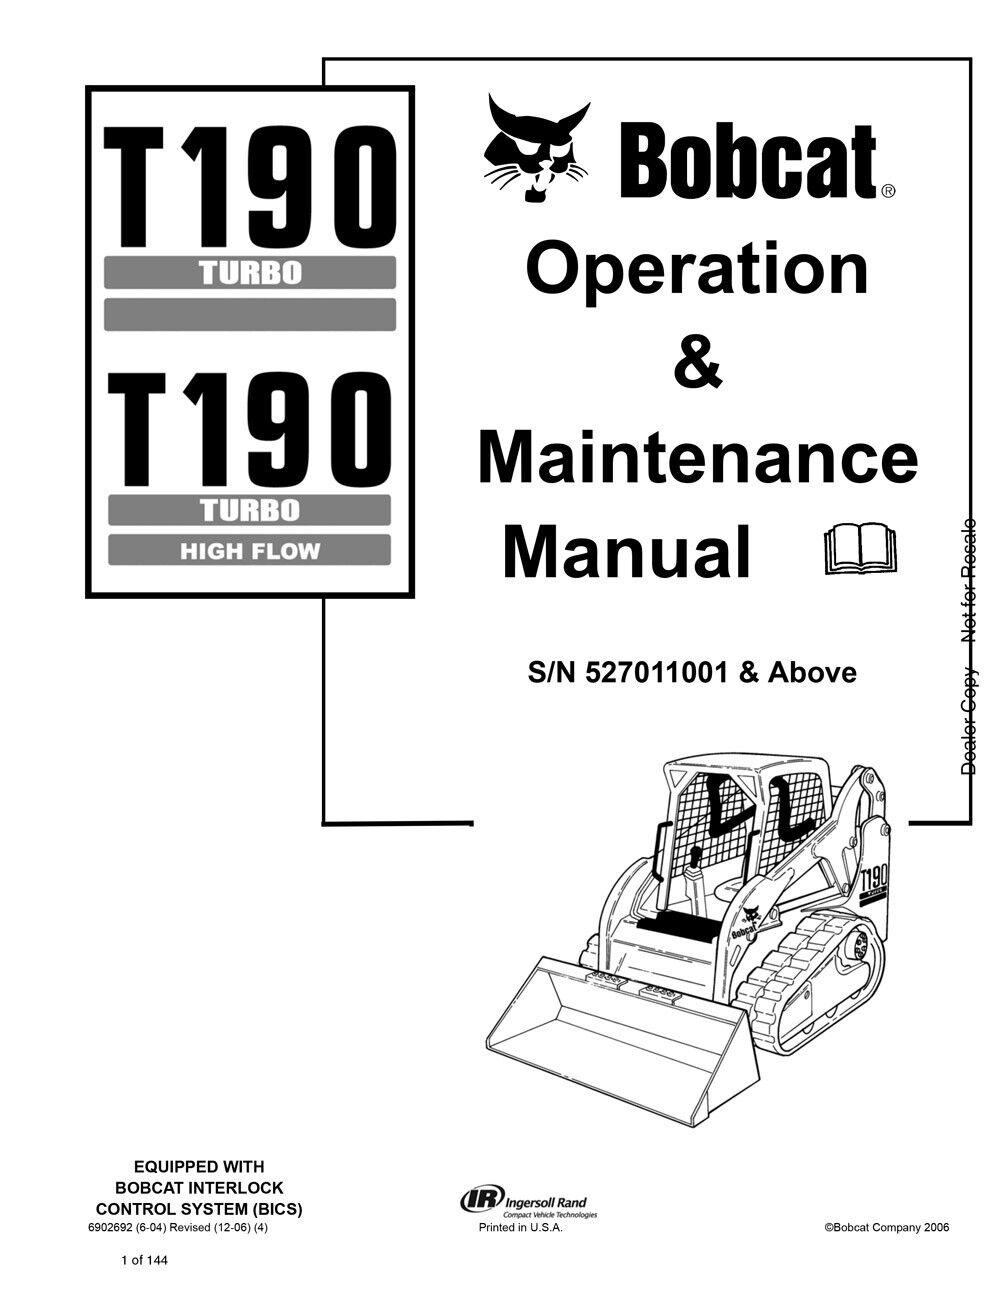 New Bobcat T190 Turbo & Highflow Operation & Maintenance